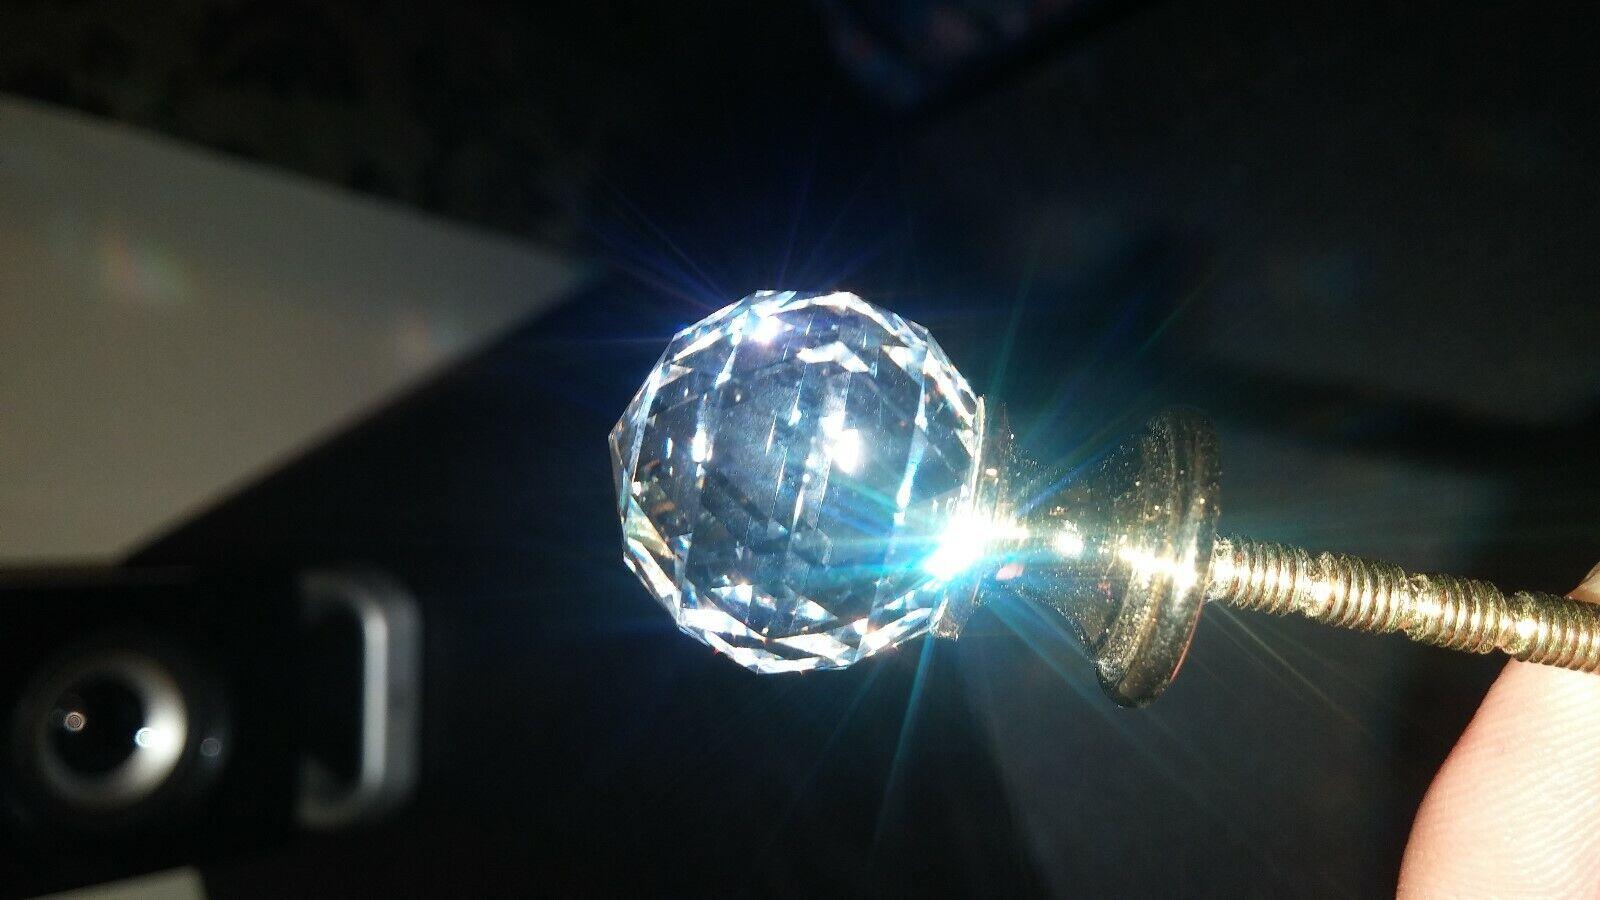 Traditional Swarovski Crystal Brass Knob - 993 - Lot of 26 Knobs